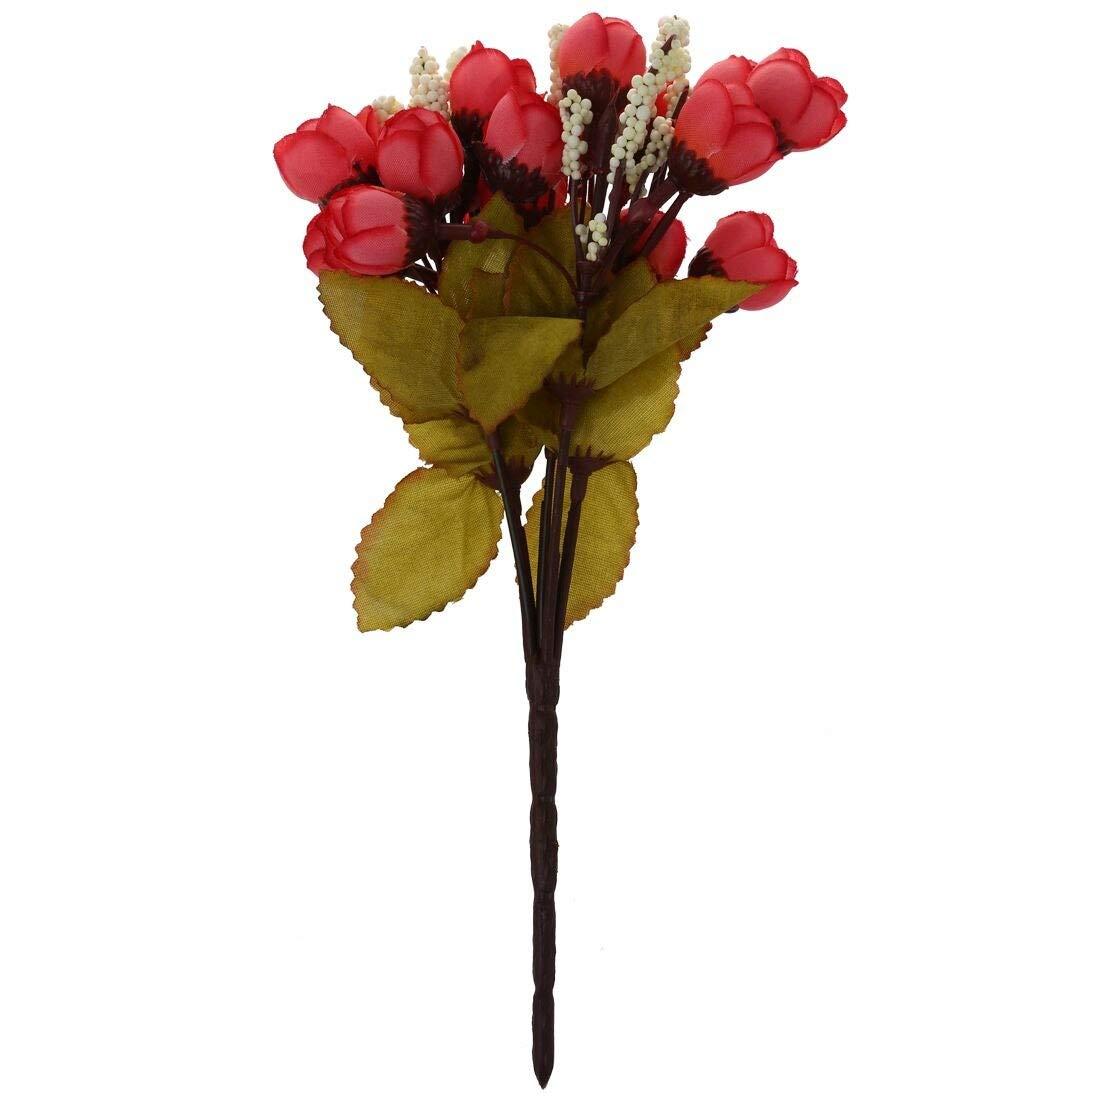 Artificial-Dried-Flowers-Silk-Cloth-Artificial-Flower-15-Heads-Mini-Rose-Home-Decor-Roses-Bouquet-Decoration-Dried-Artificial-Flowers-Artificial-Dried-Flowers-Gardenia-Flower-Bouquet-Chry